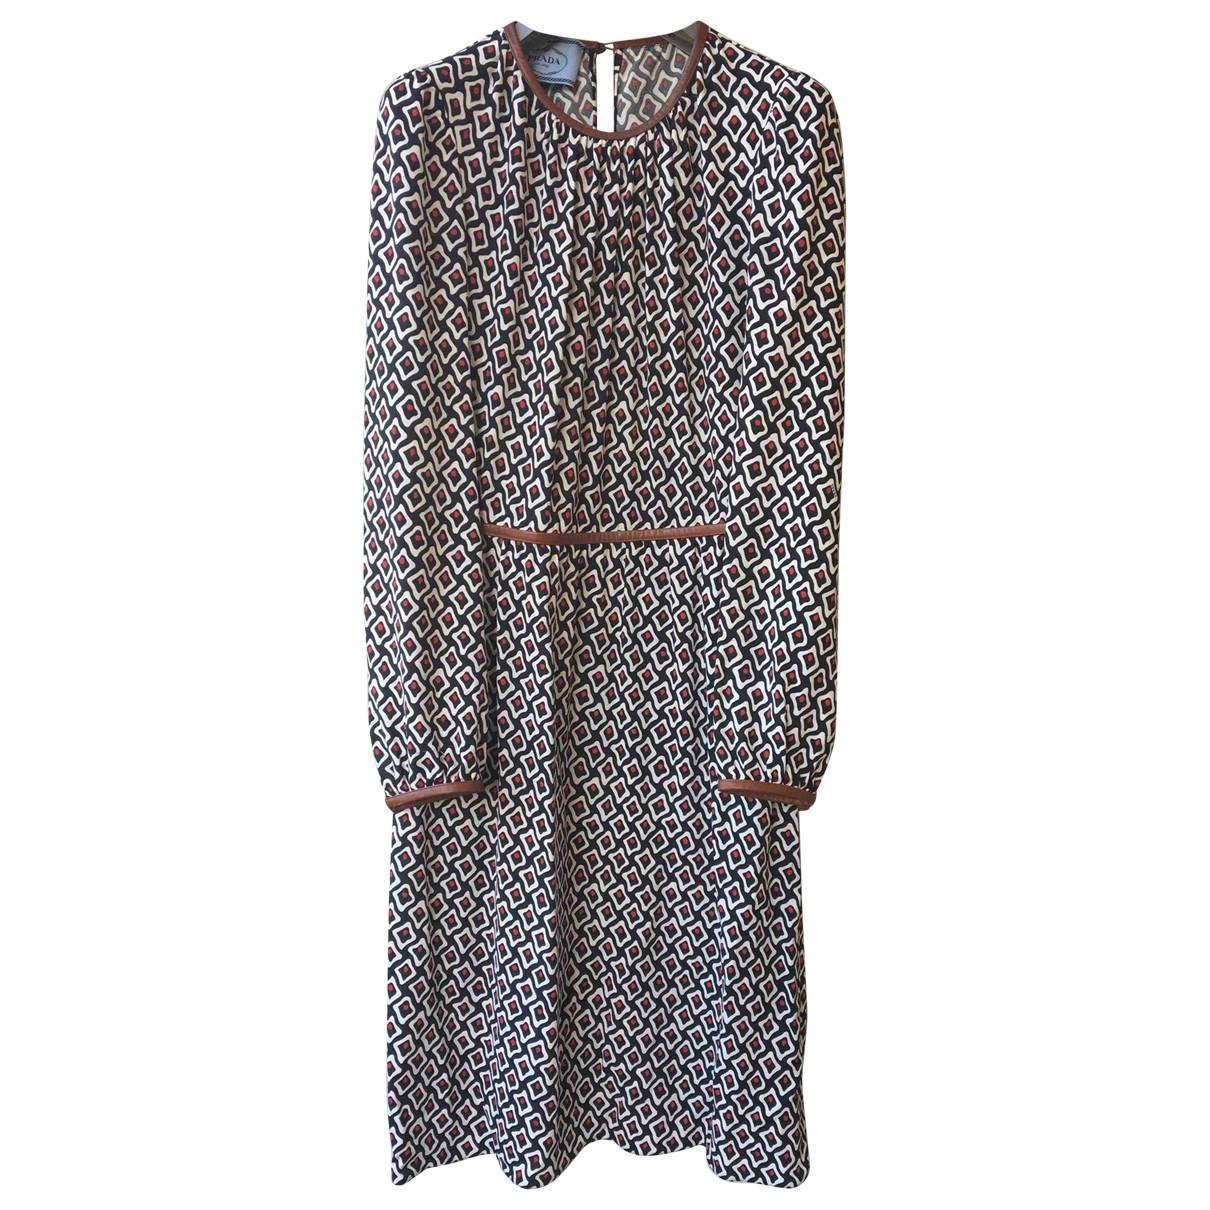 Prada \N Multicolour dress for Women 38 IT